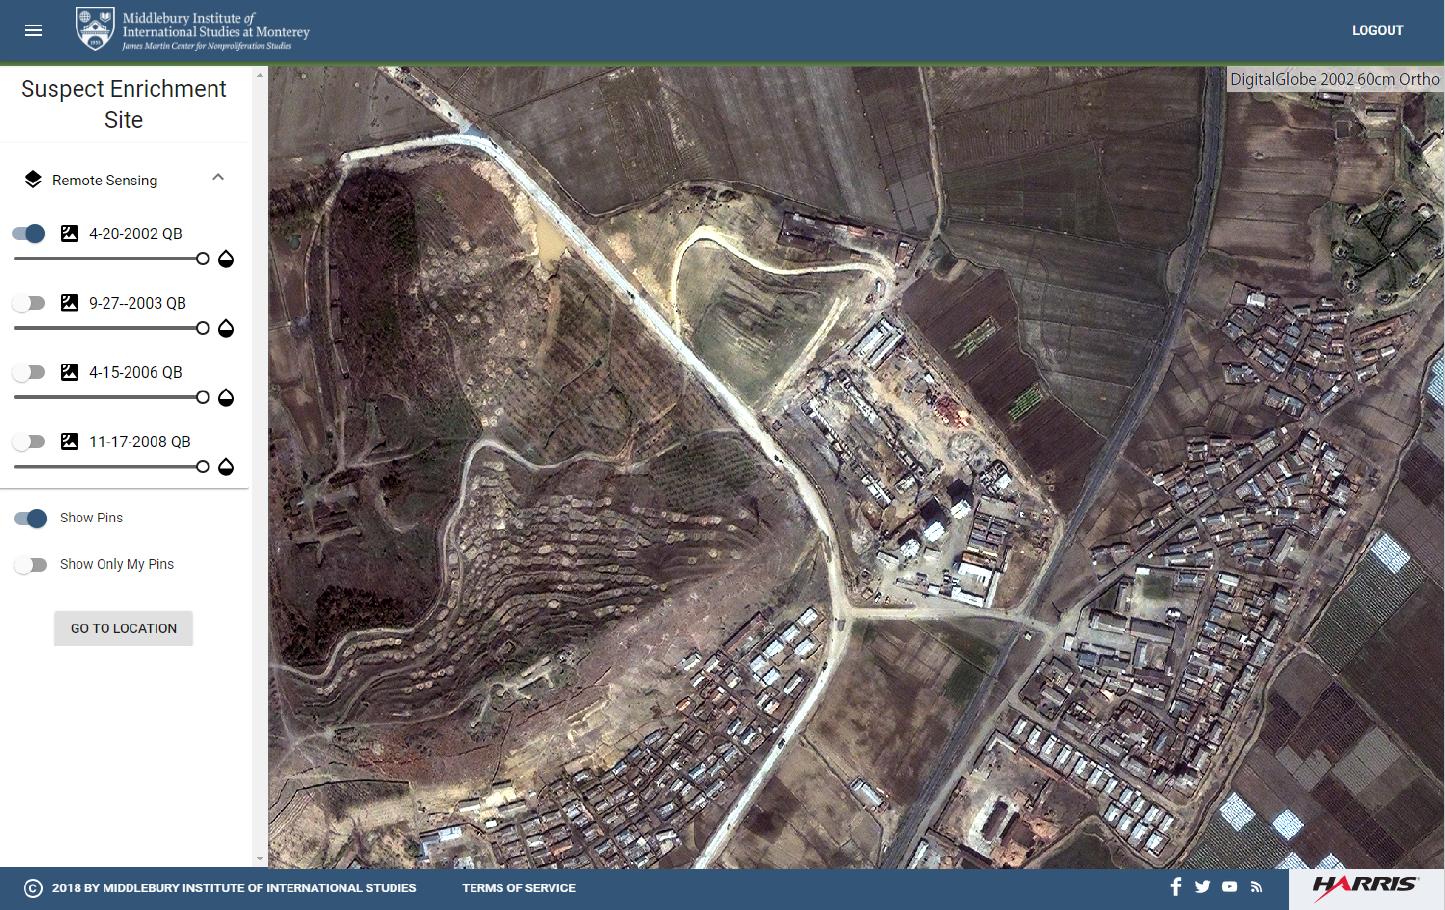 thediplomat-exclusive-revealing-kangson-north-koreas-first-covert-uranium-enrichment-site-kangson-2002-unpixelated.png